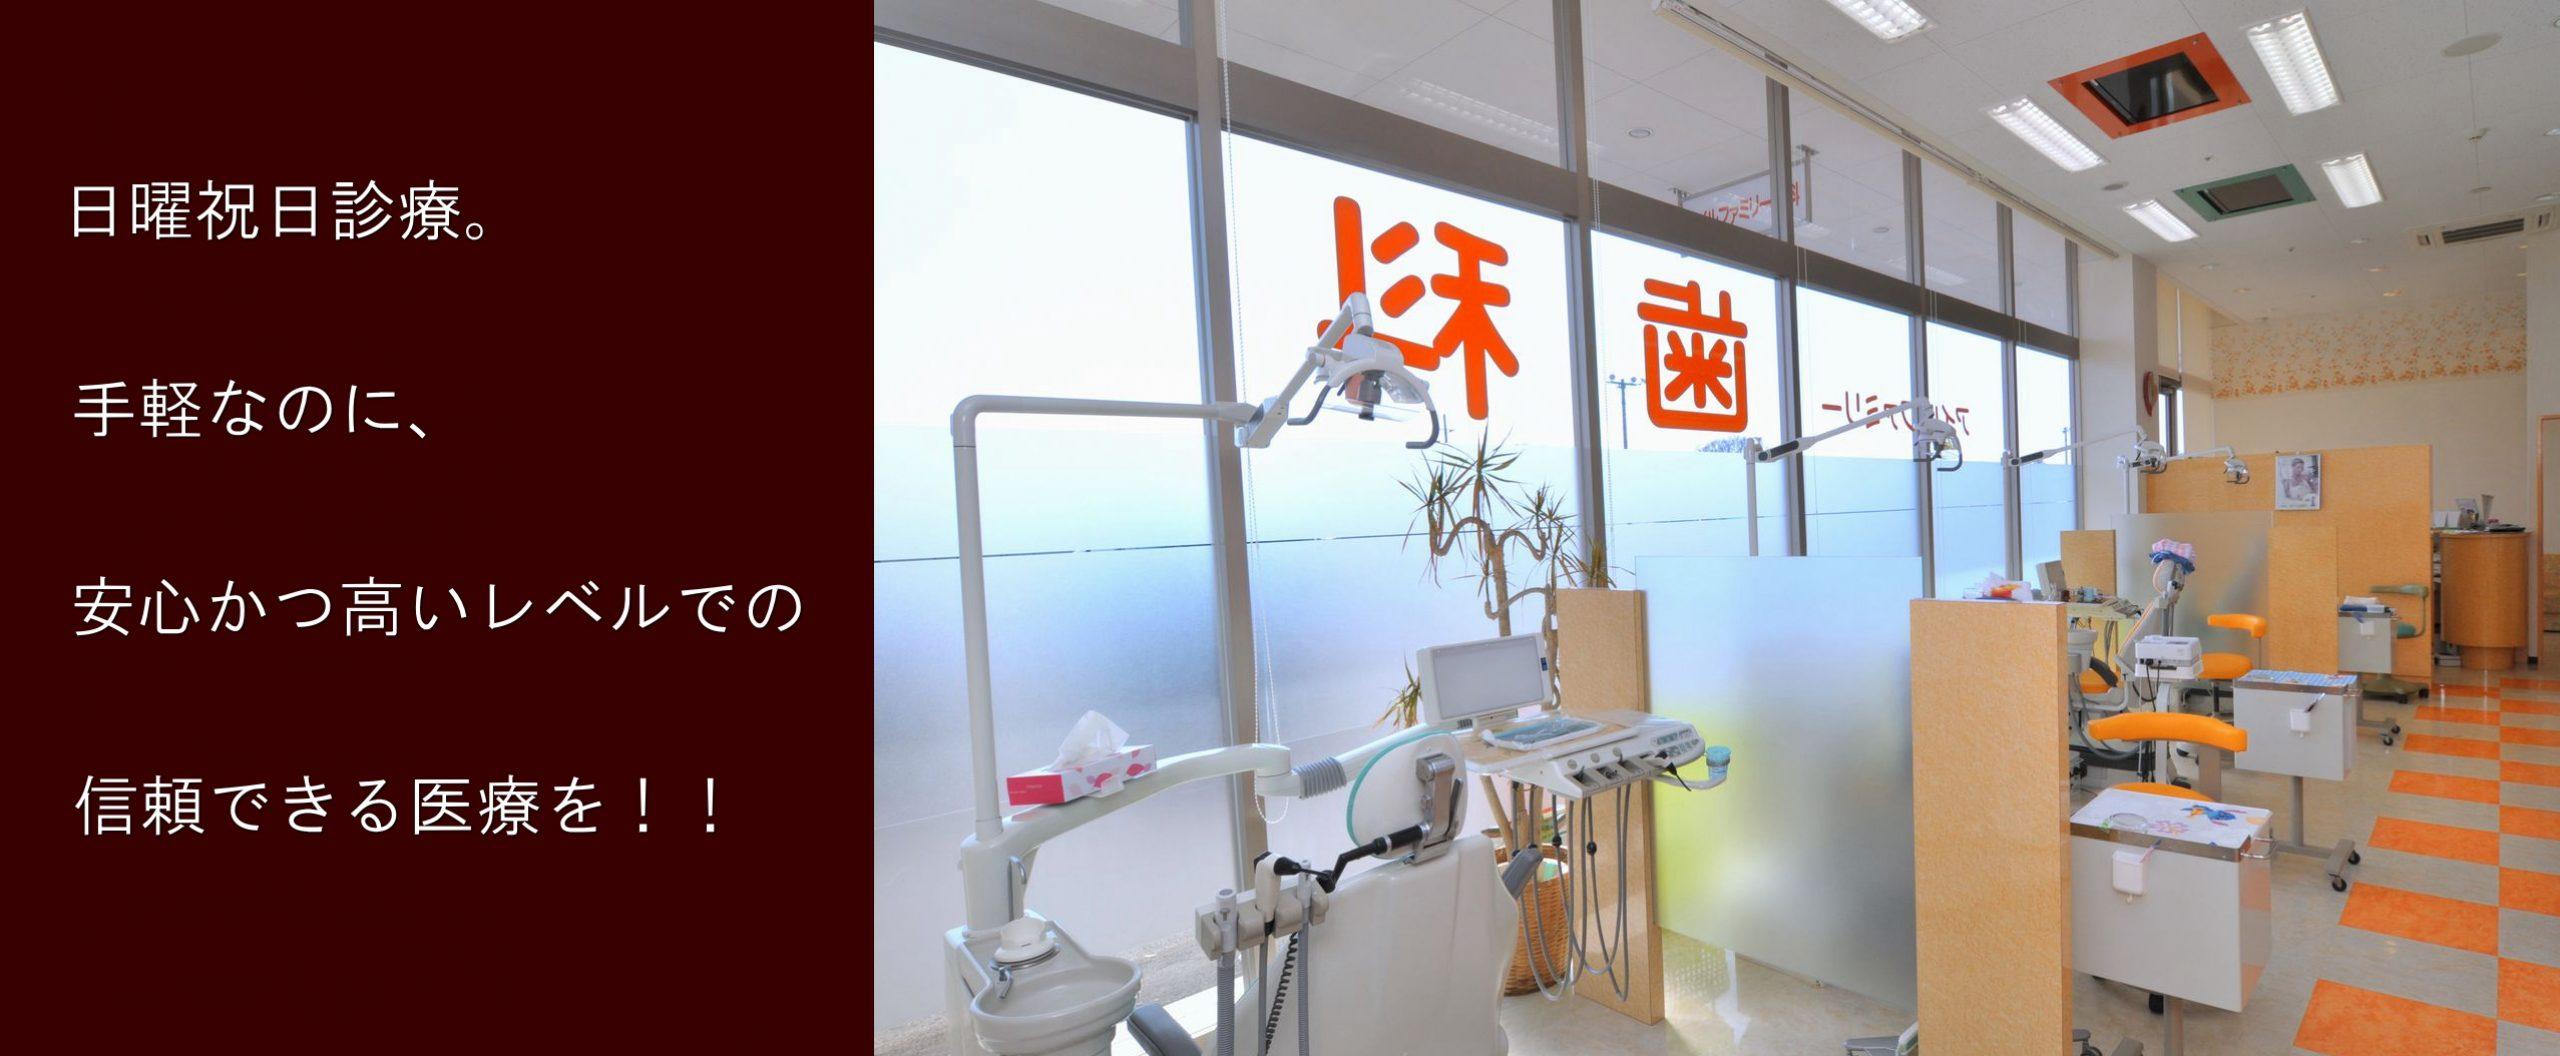 古河市|訪問歯科|アイルファミリー歯科